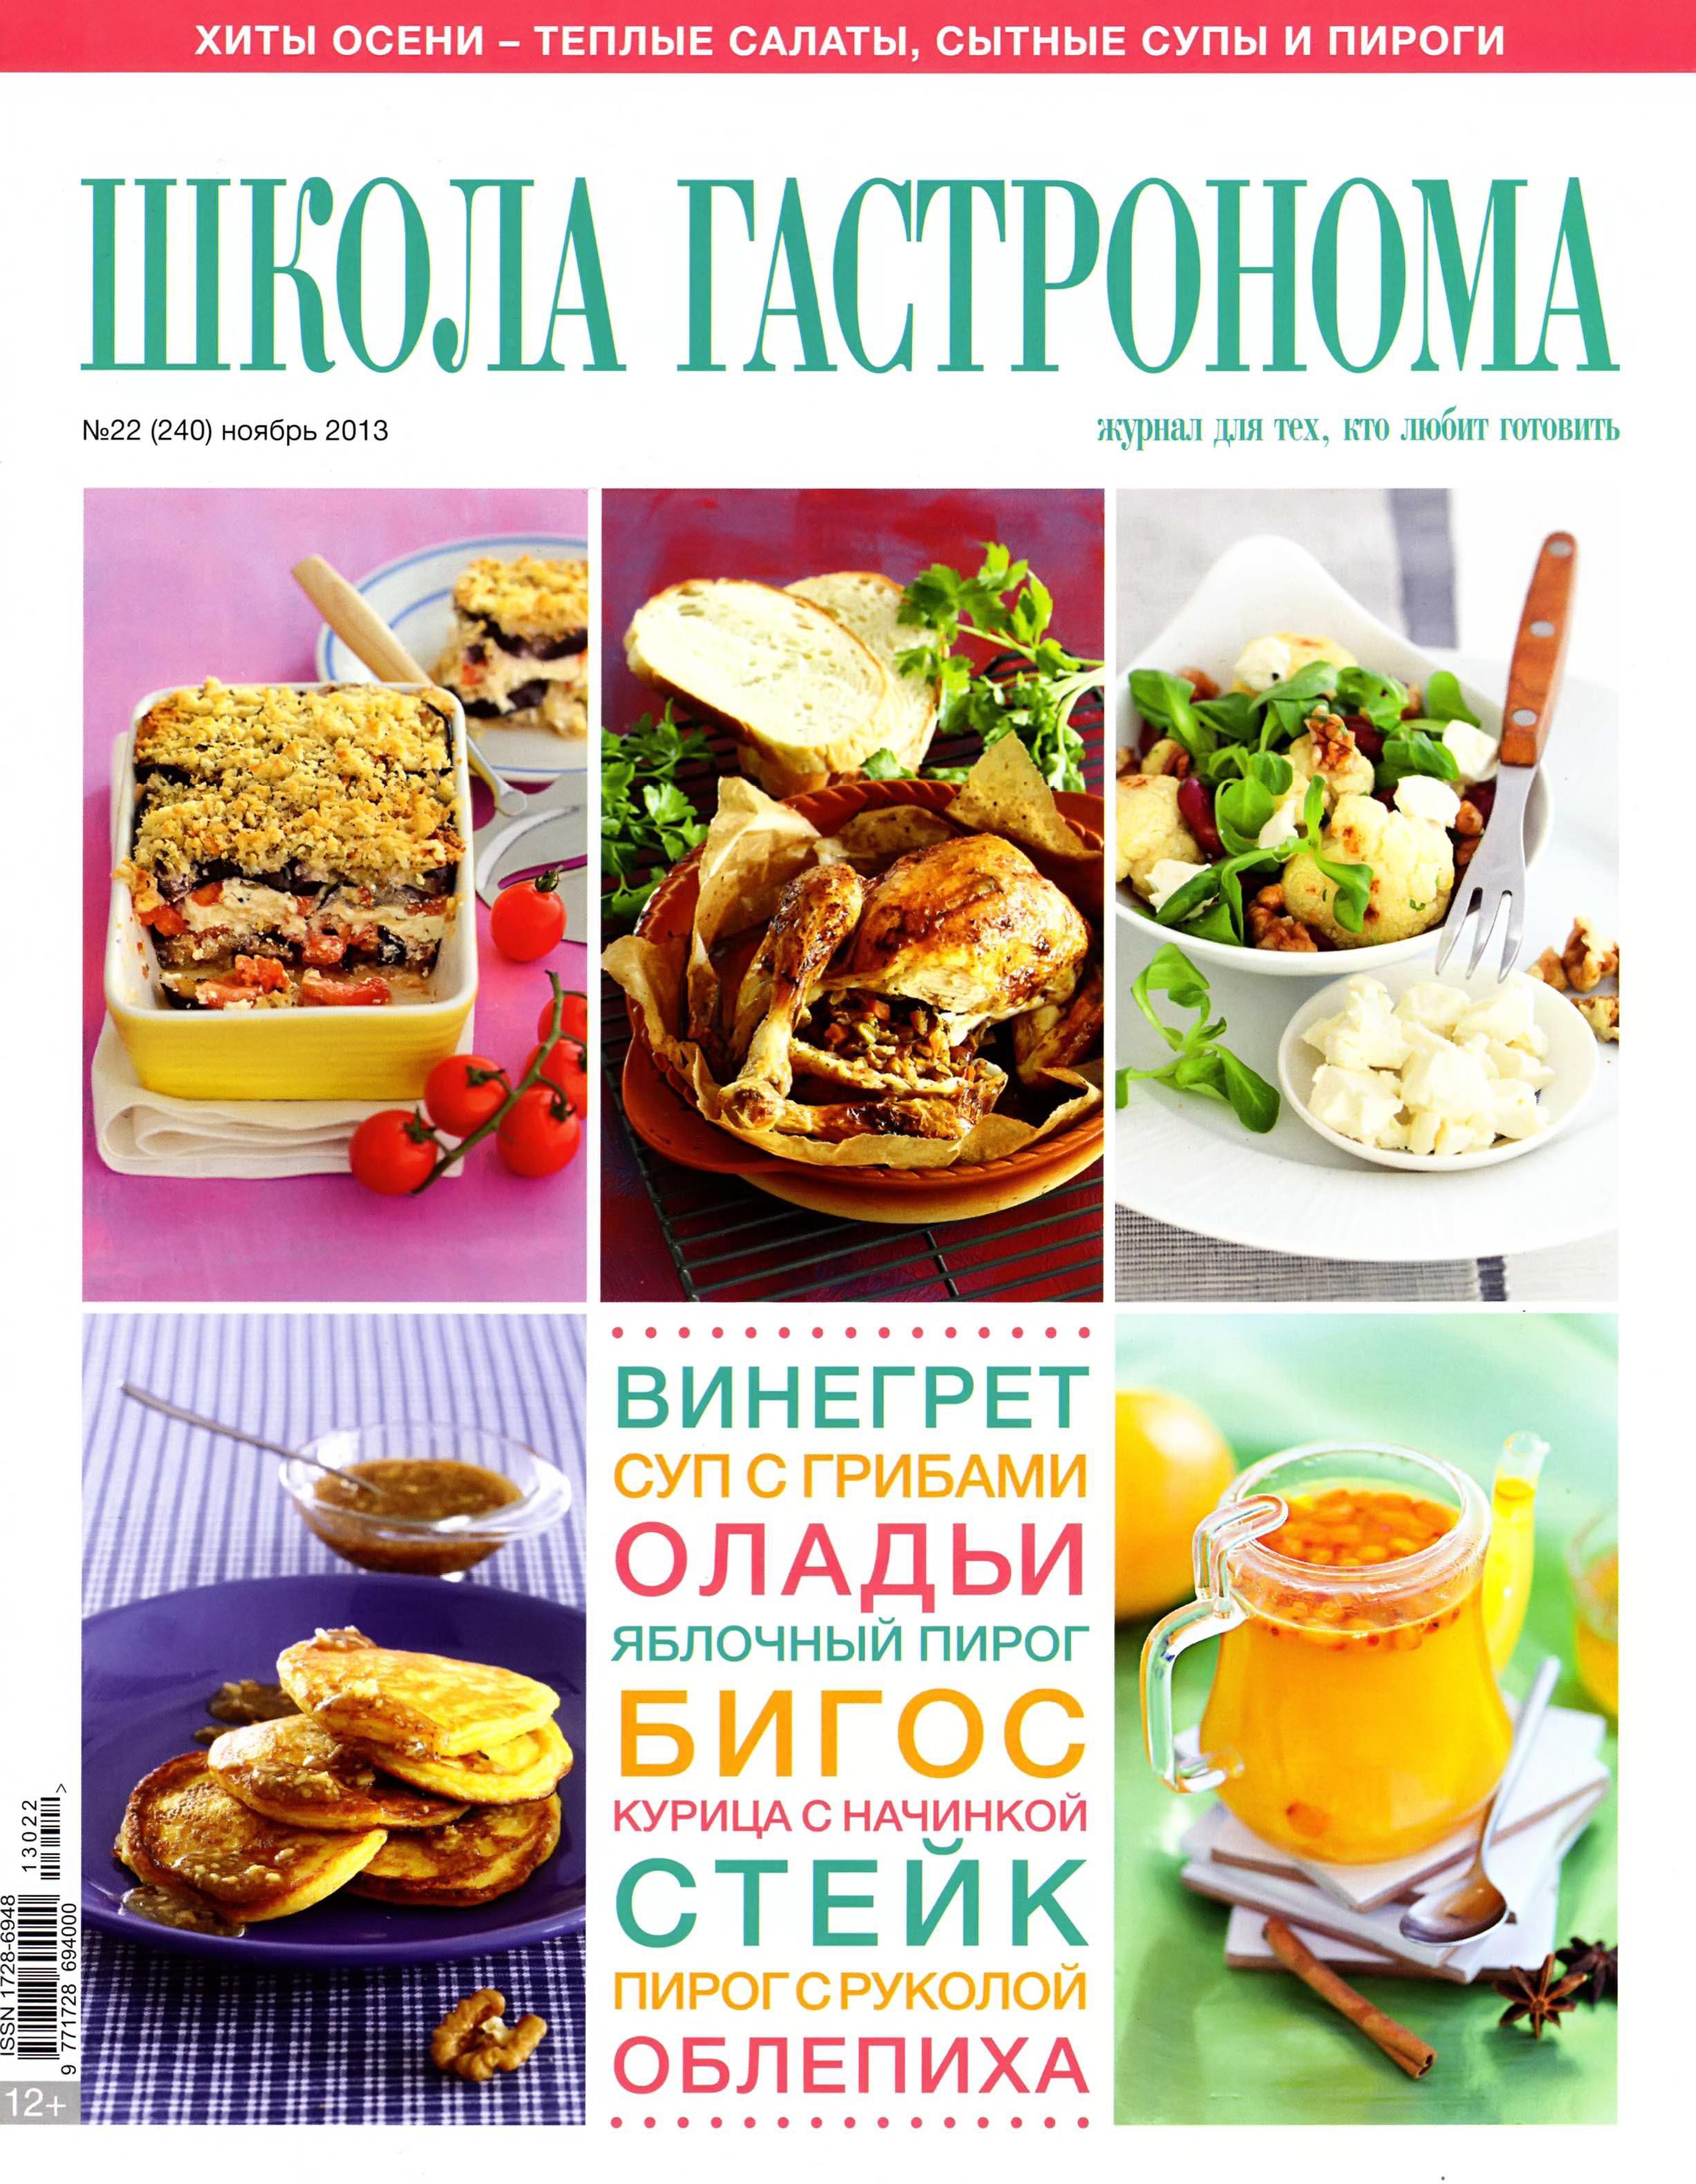 SHkola gastronoma    22 2013 goda Школа гастронома